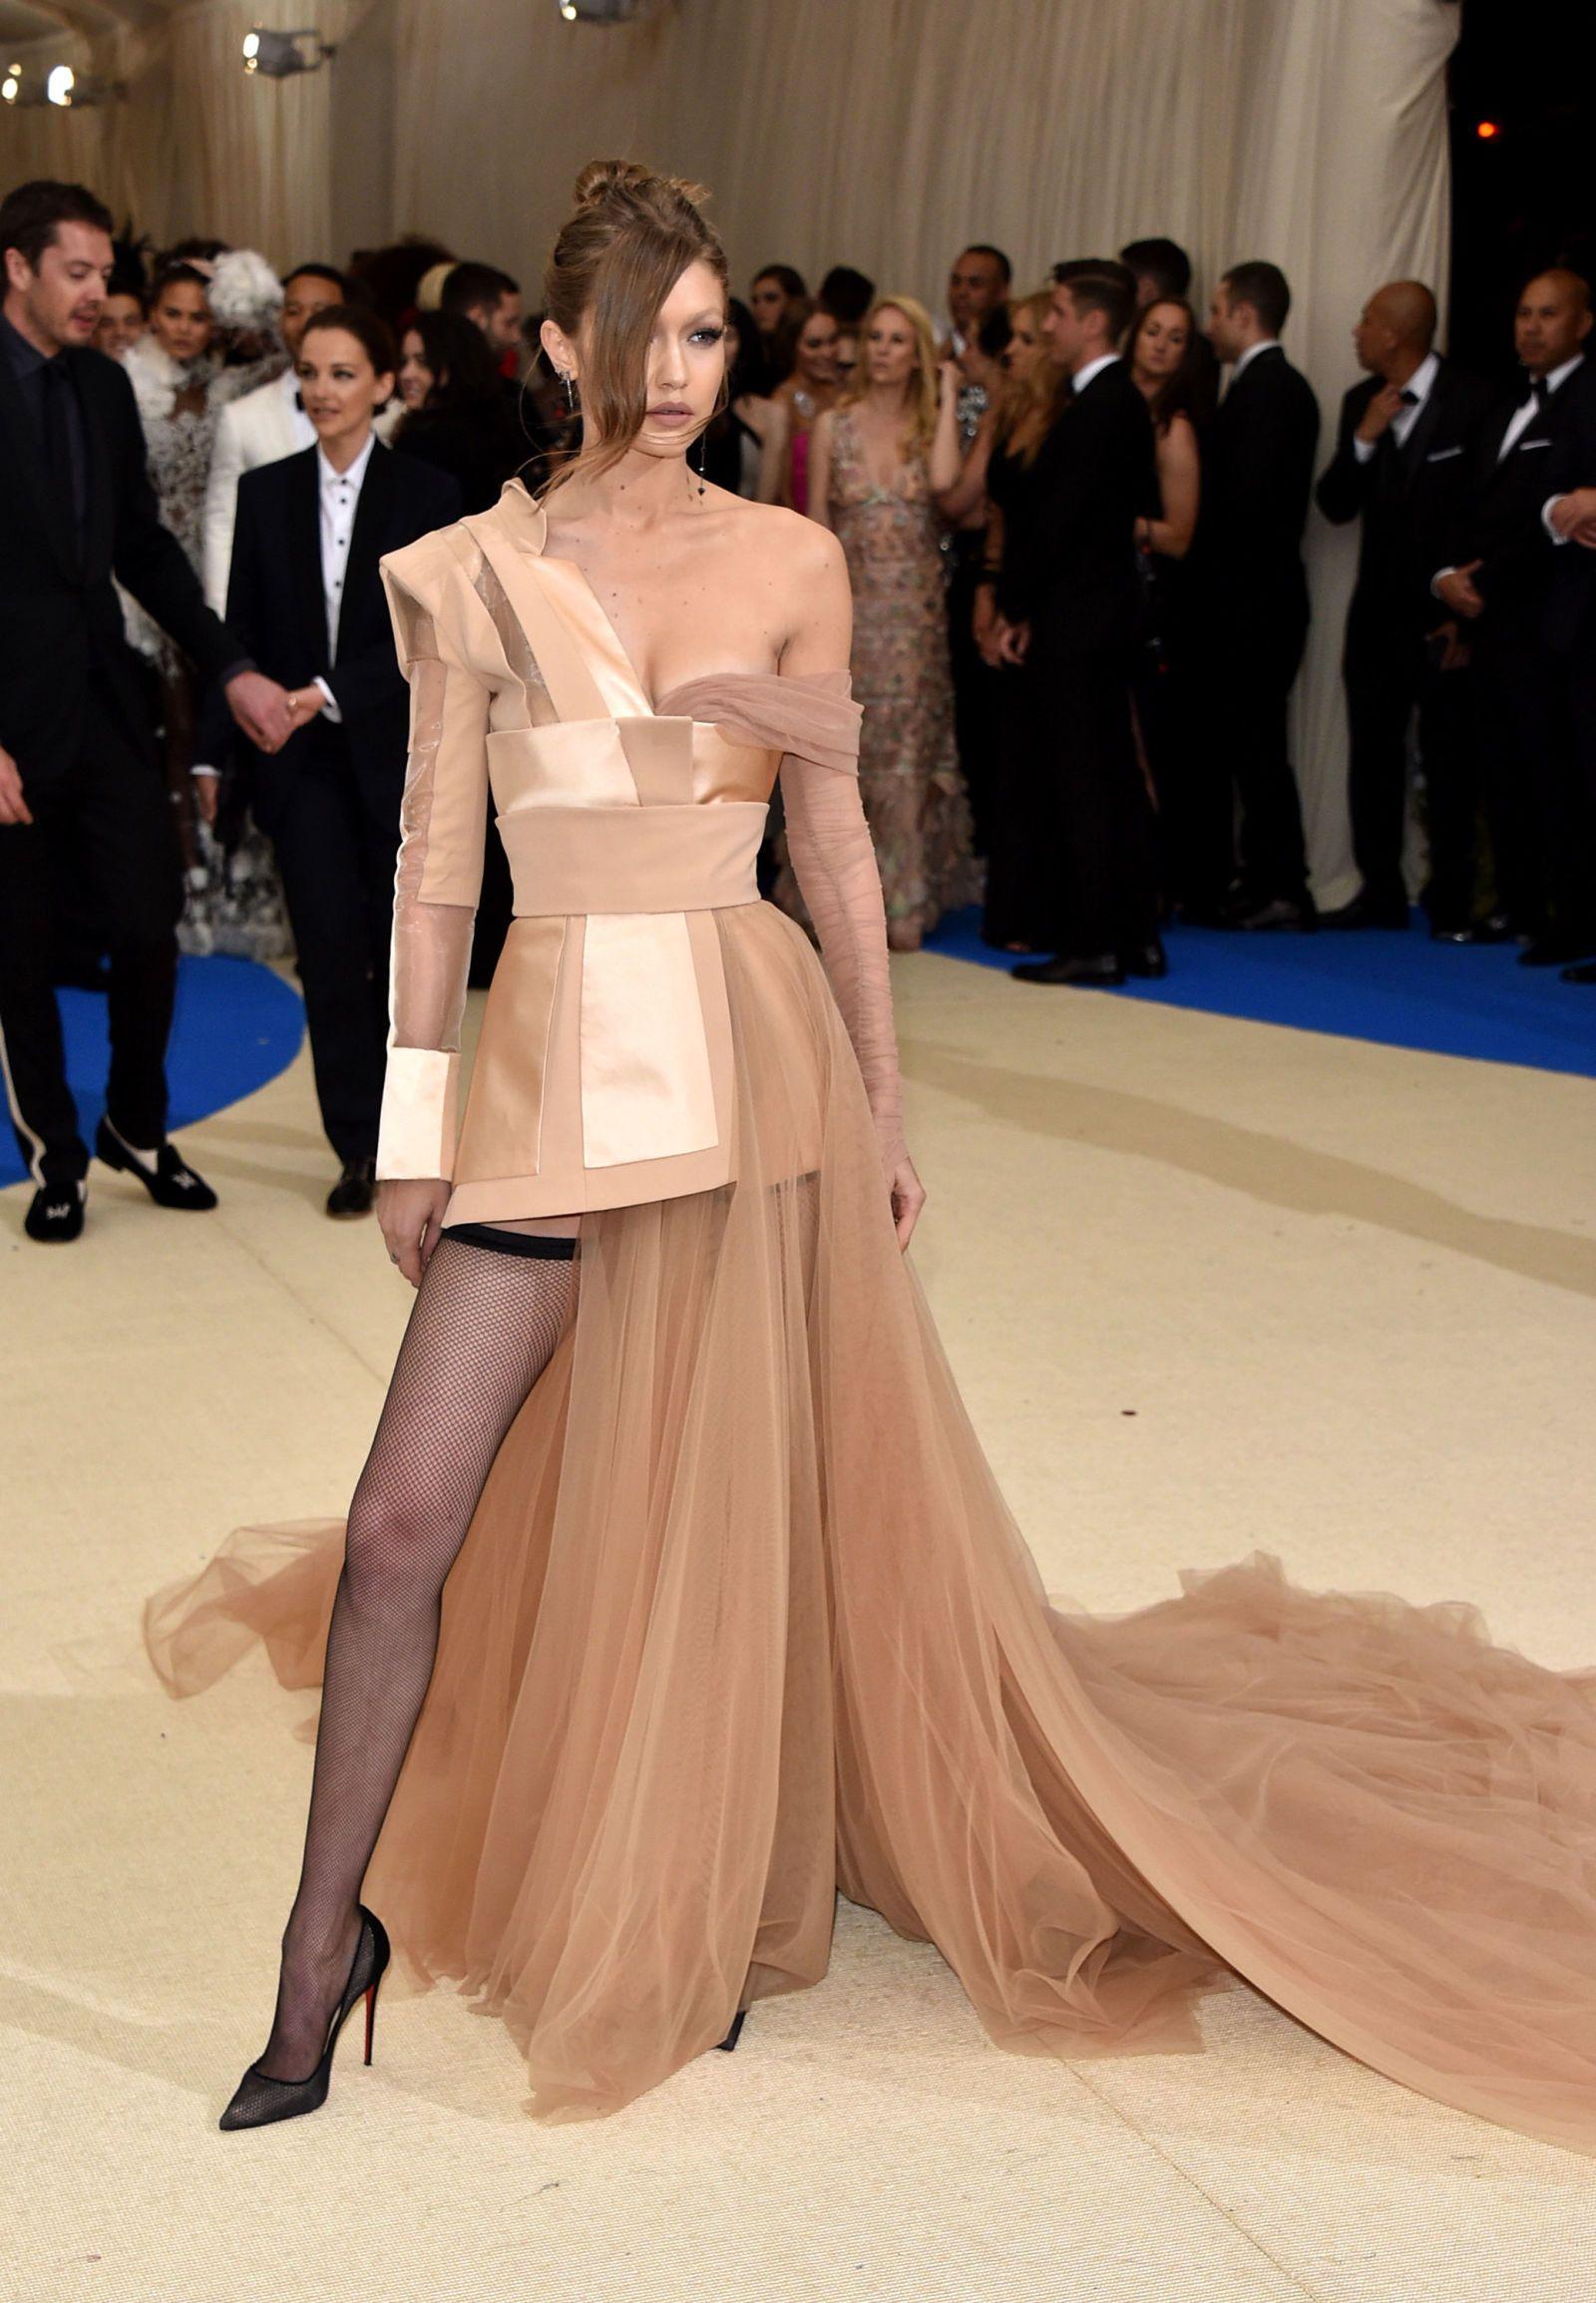 Gigi Hadid Wears a Nude, Tommy Hilfiger Cinderella Dress to the Met ...